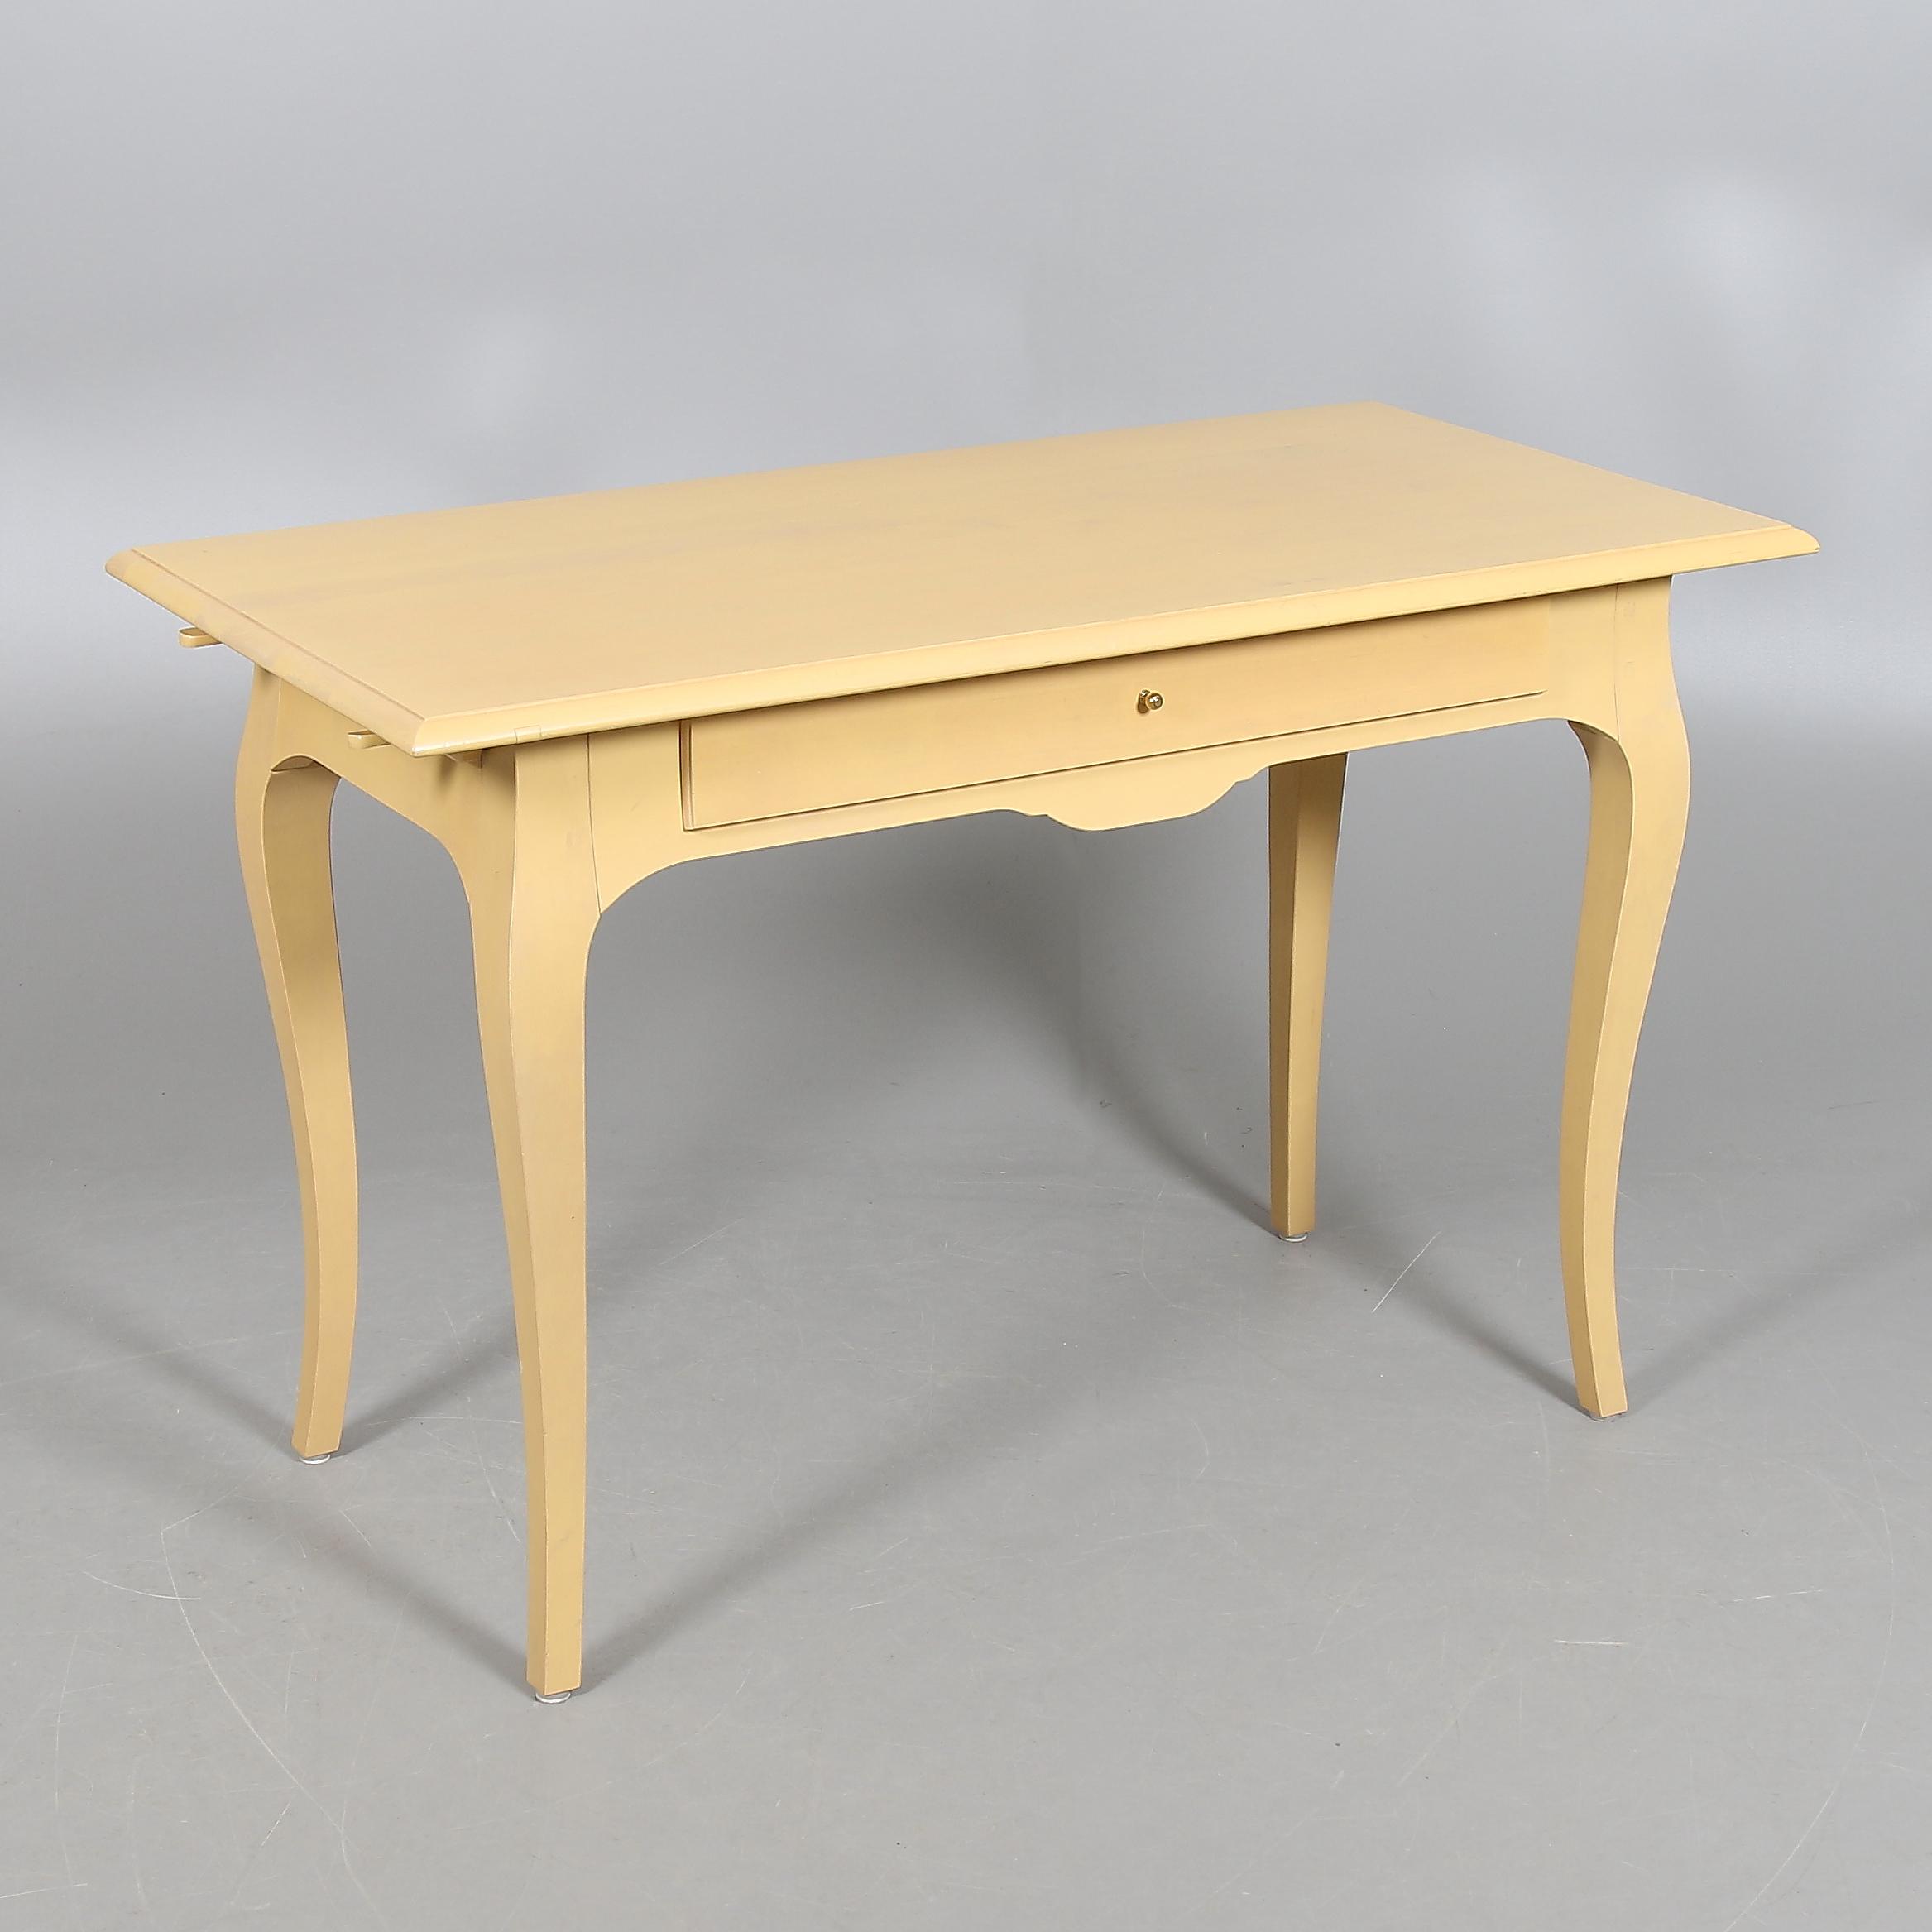 Auktion | Skrivbord Österby Bruk Ikea | Stockholms